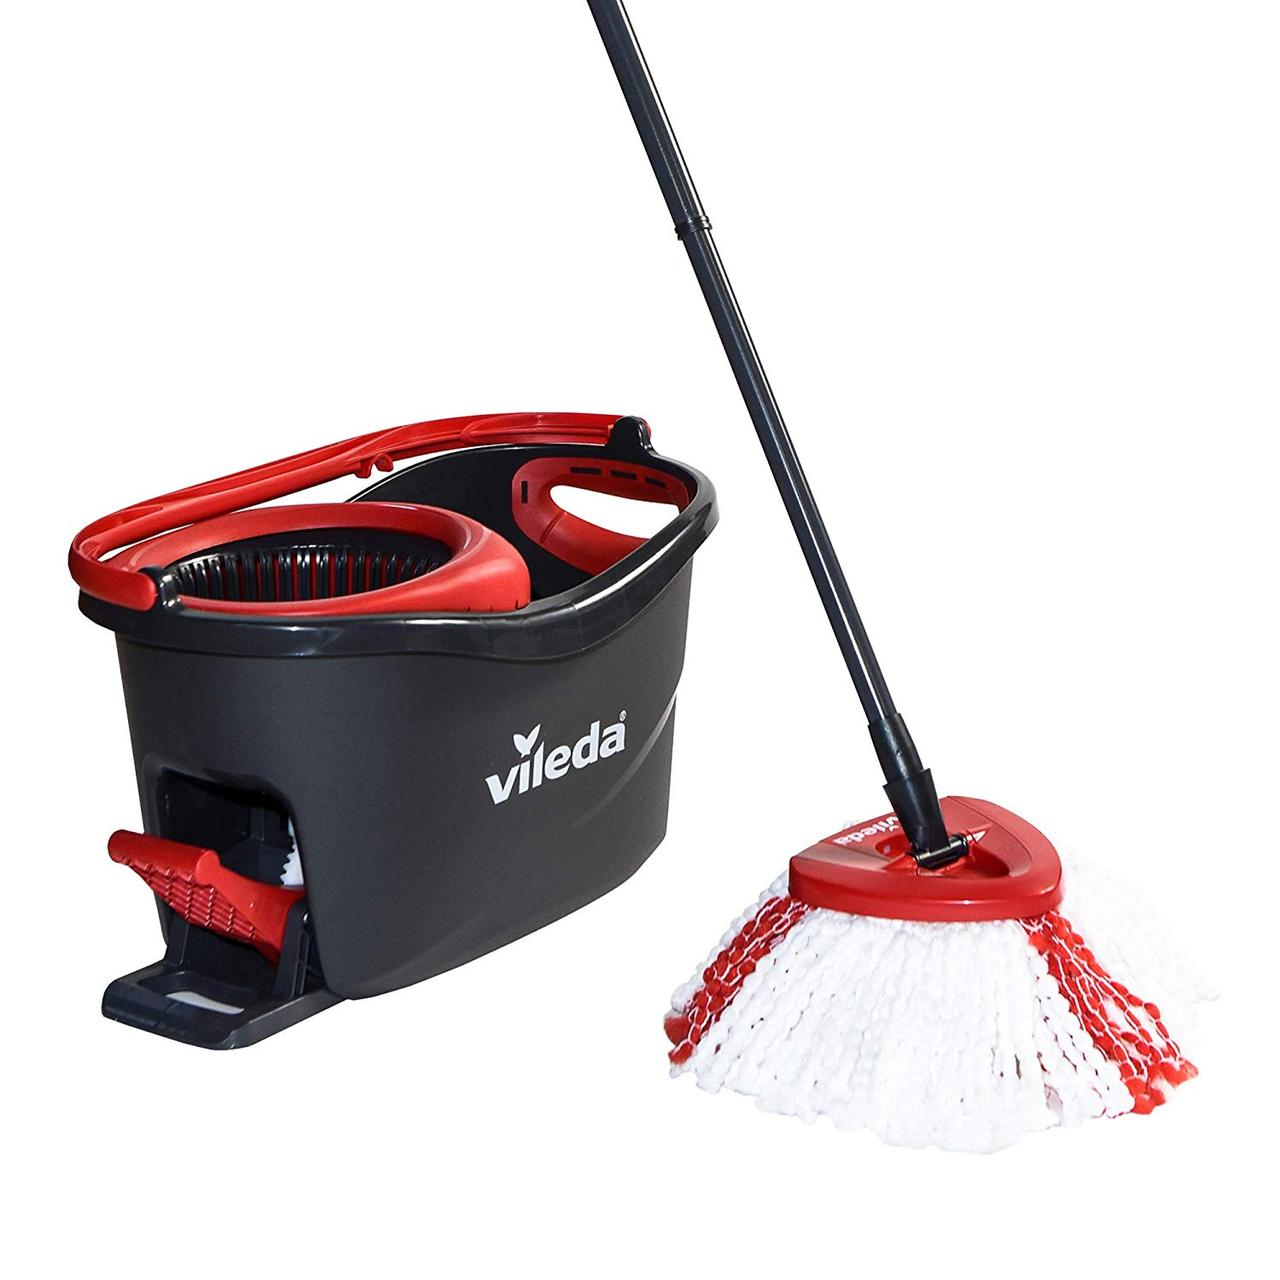 Ведро - Vileda Easywring & Clean Turbo